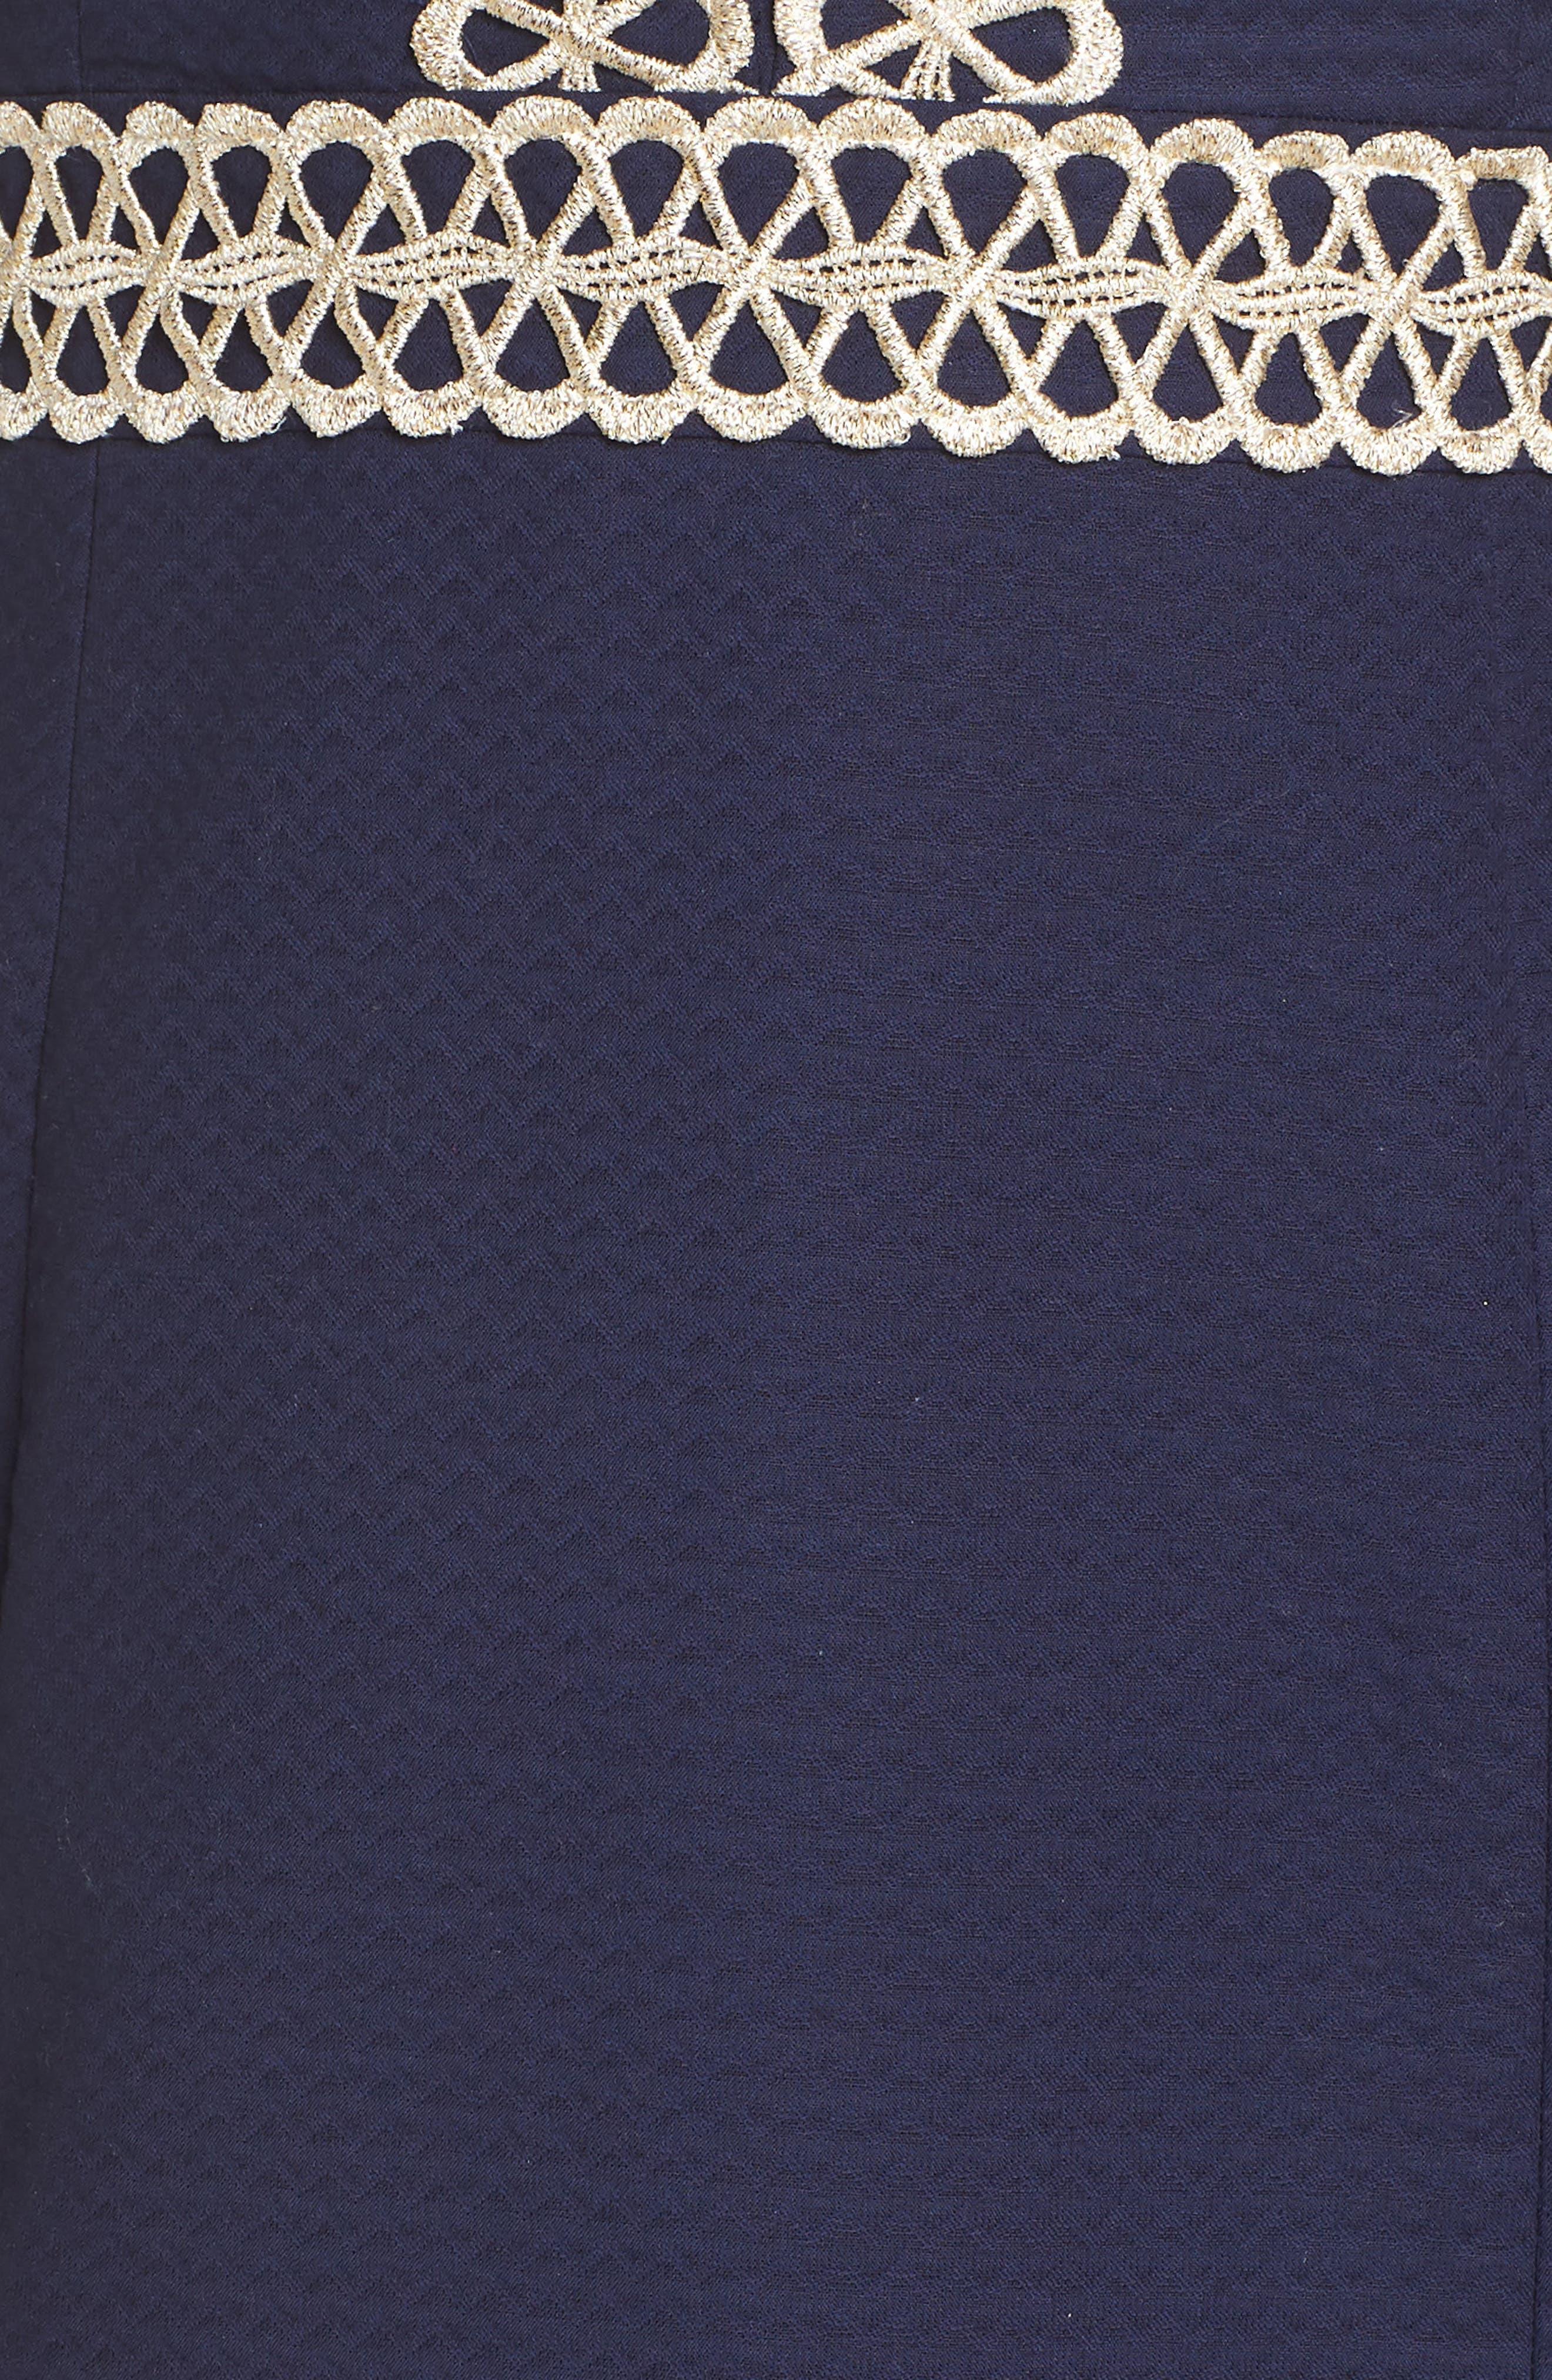 Trista Halter Sheath Dress,                             Alternate thumbnail 6, color,                             408